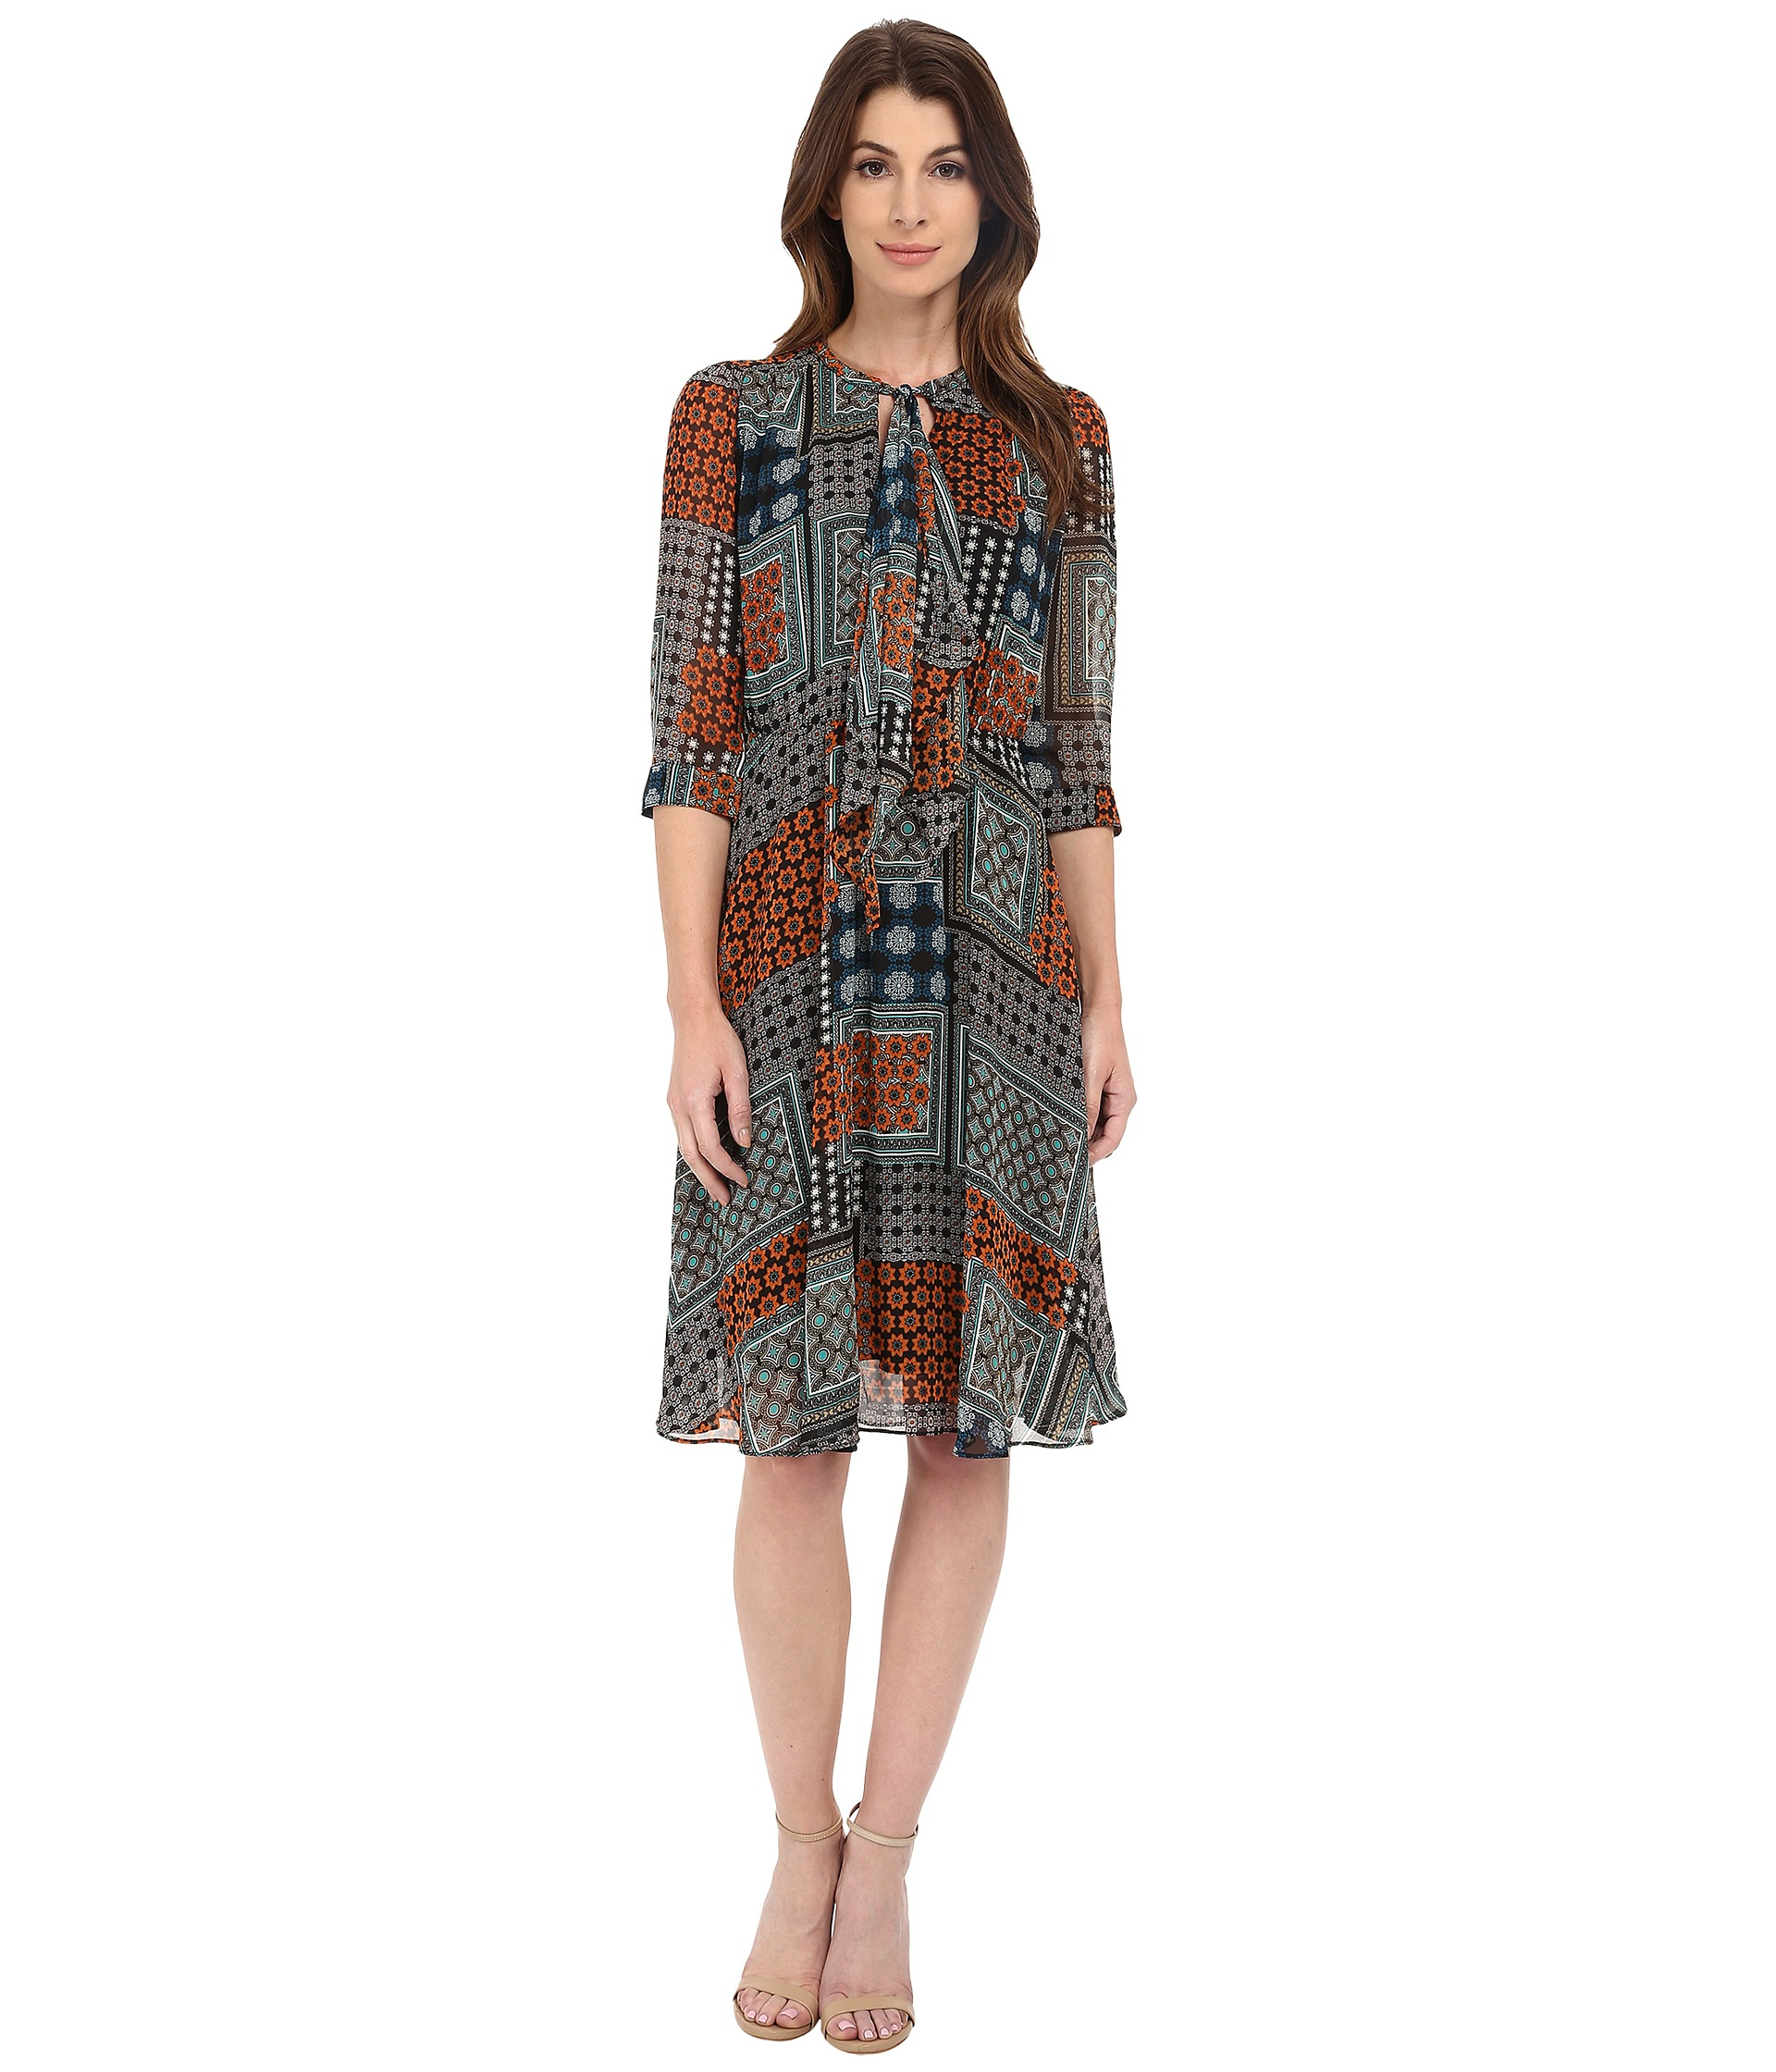 327390abb2 Lyst - Kut From The Kloth Chloe Dress in Blue